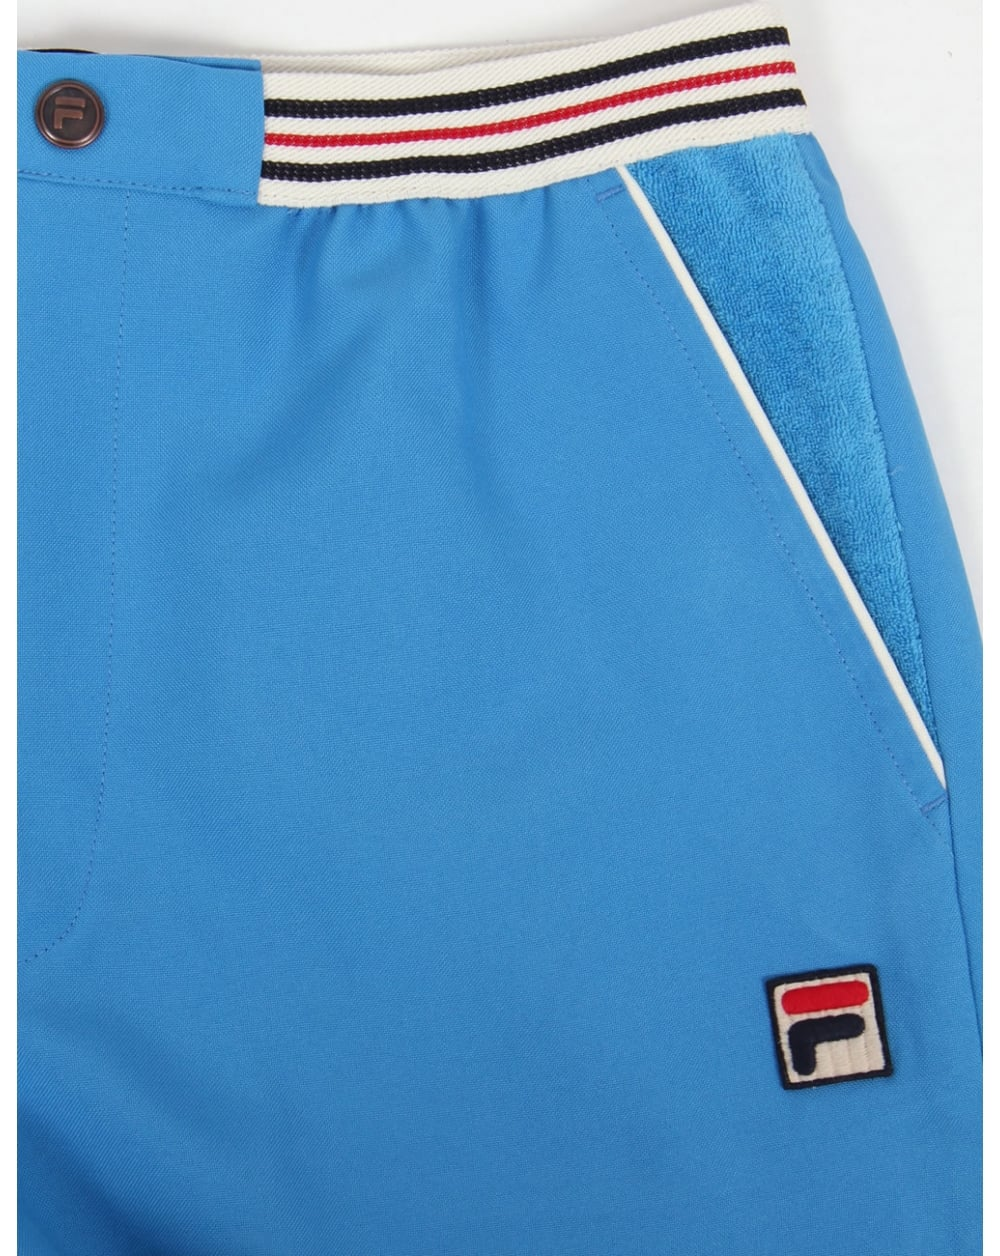 76a9703b03a37 Fila Vintage High Tide Shorts French Blue,retro,striped,mens